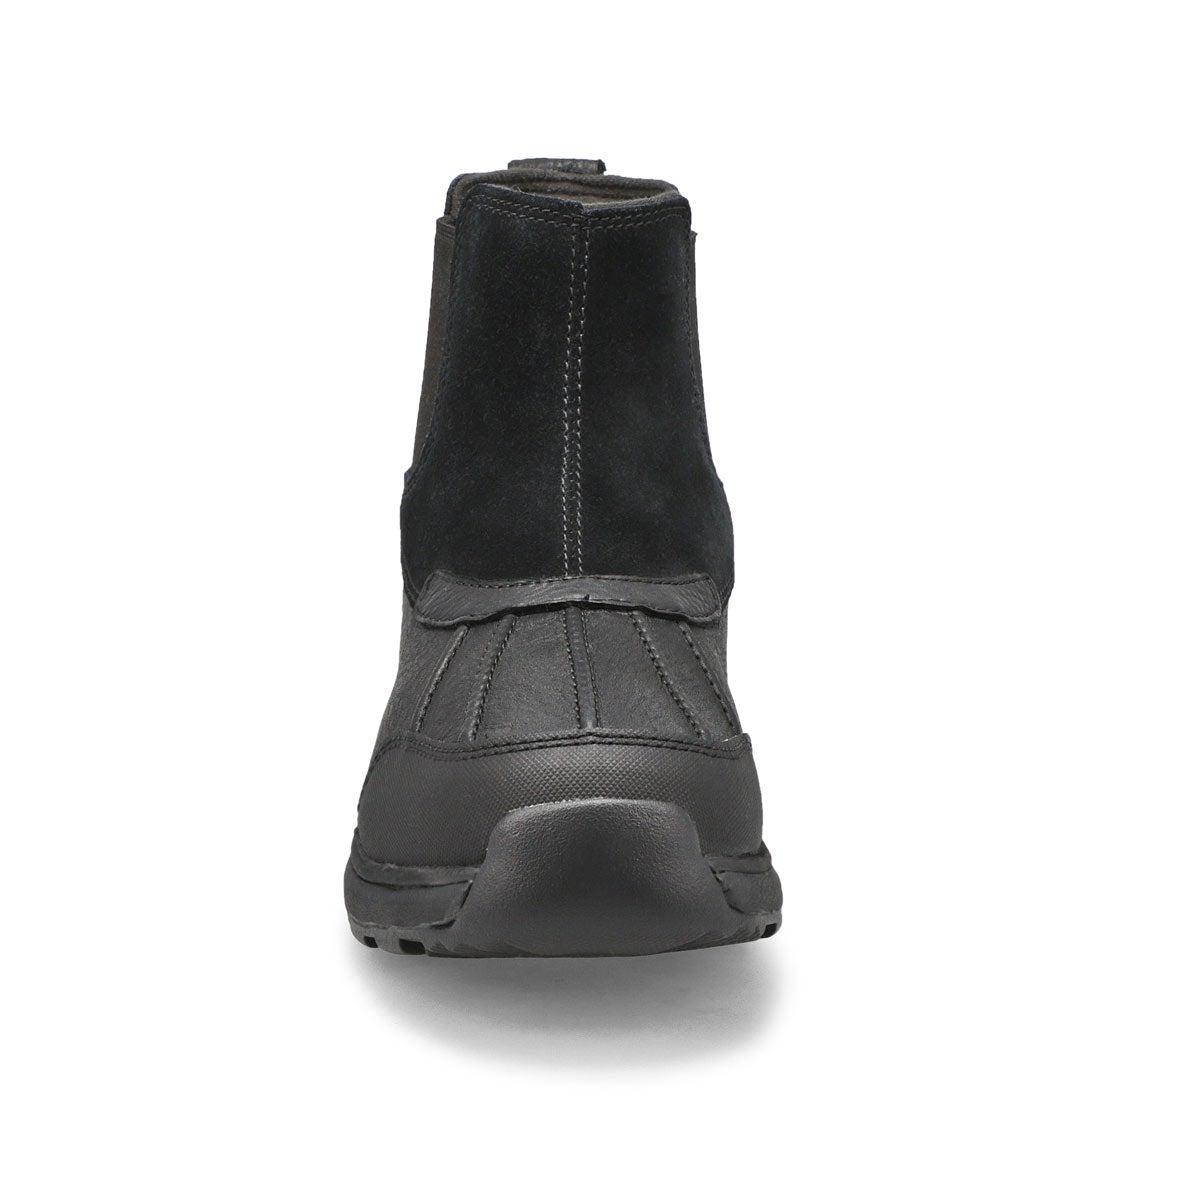 Women's Adirondack III Chelsea Winter Boot - Black